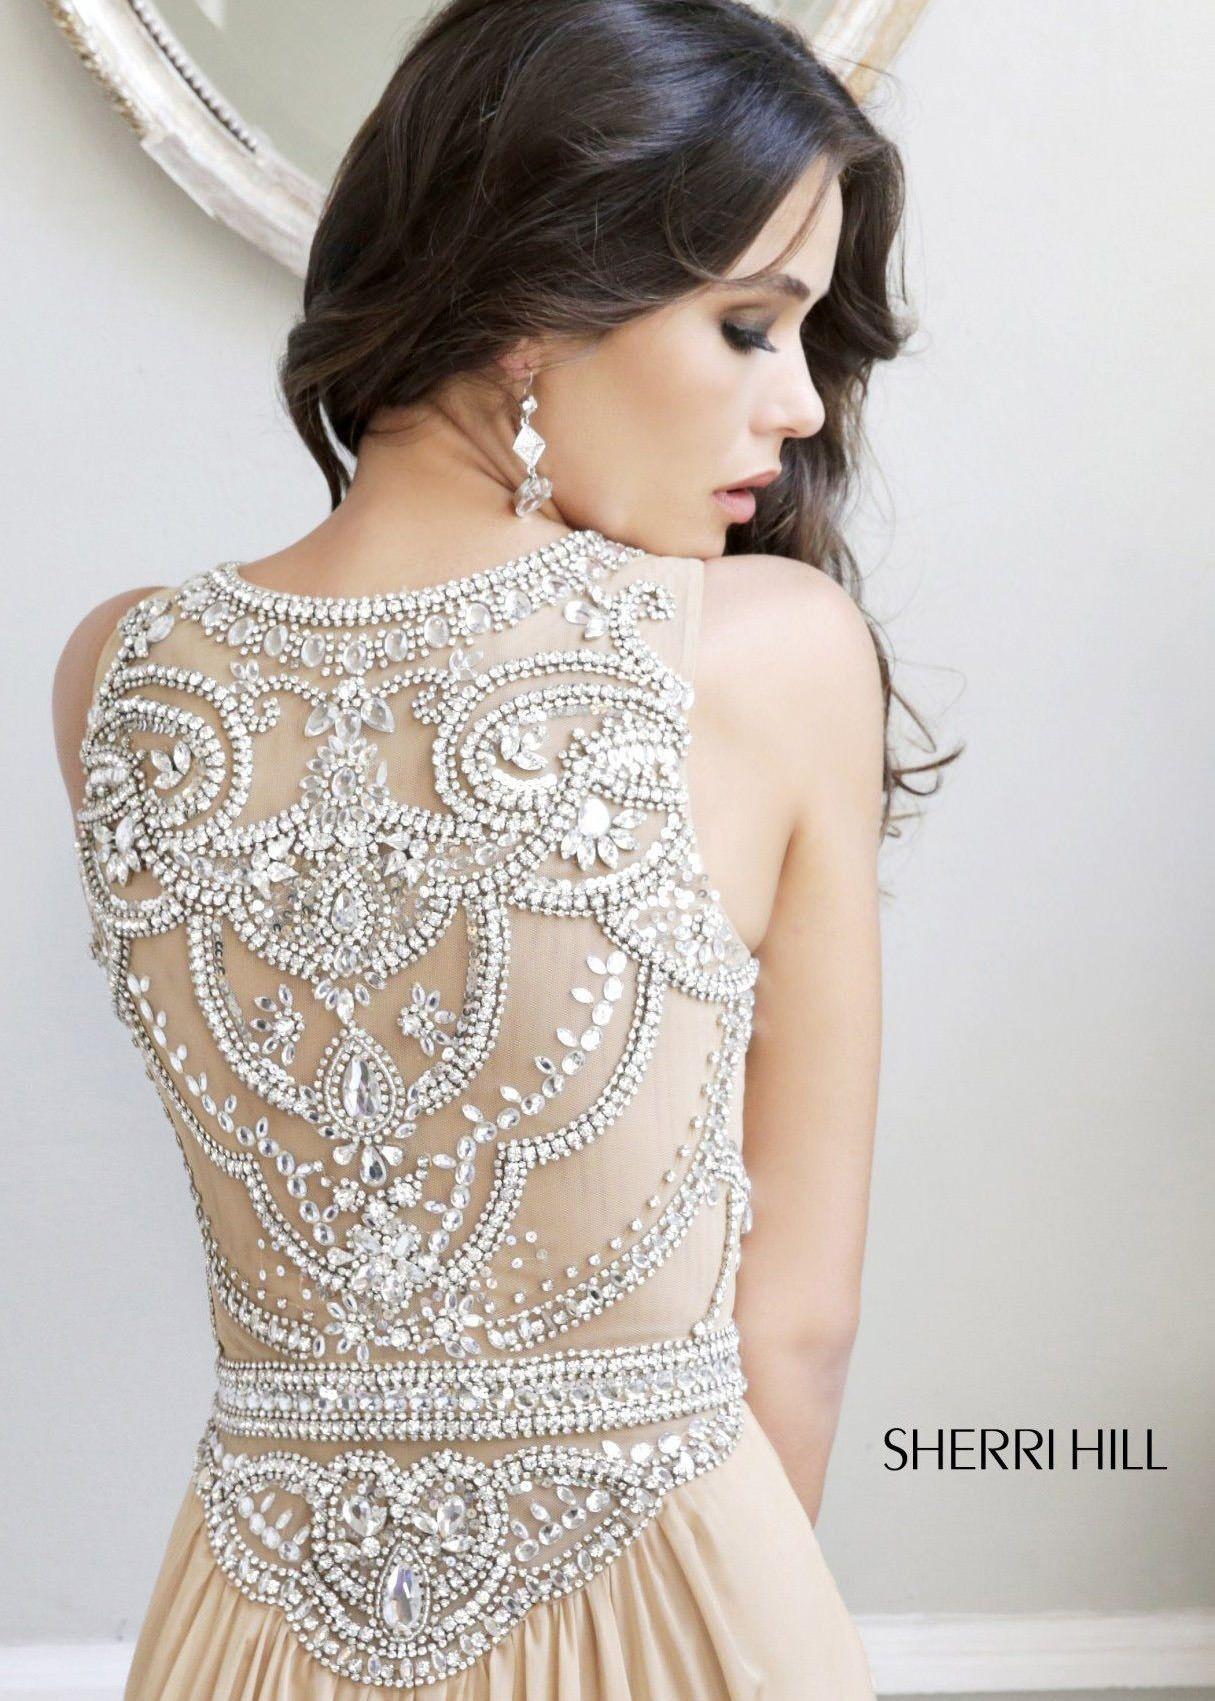 e815accb64fbd Sherri Hill 11069 - Nude/Silver Beaded Chiffon Dress - RissyRoos.com ...